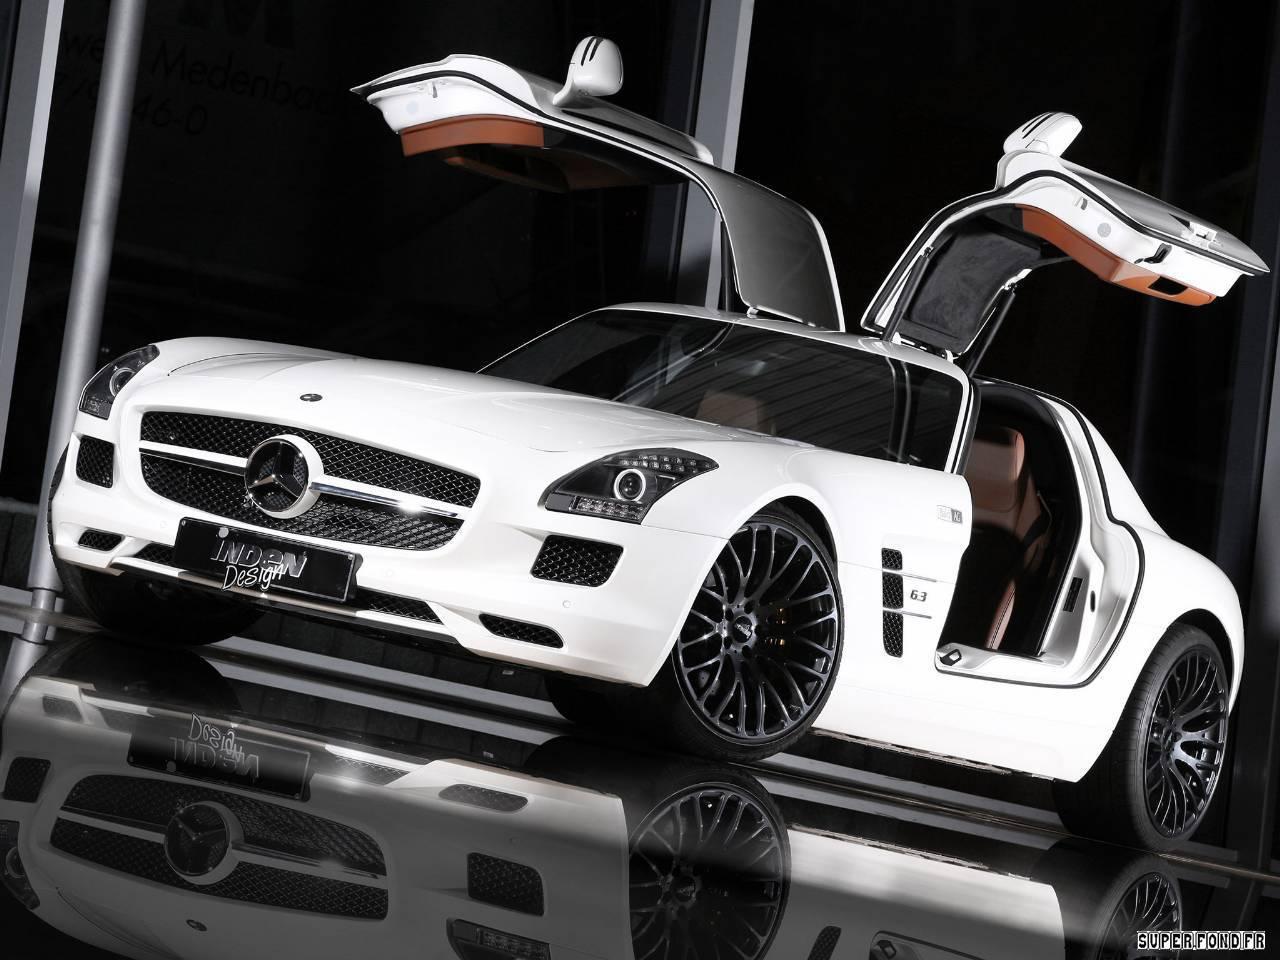 2012 Inden Design - Mercedes SLS AMG